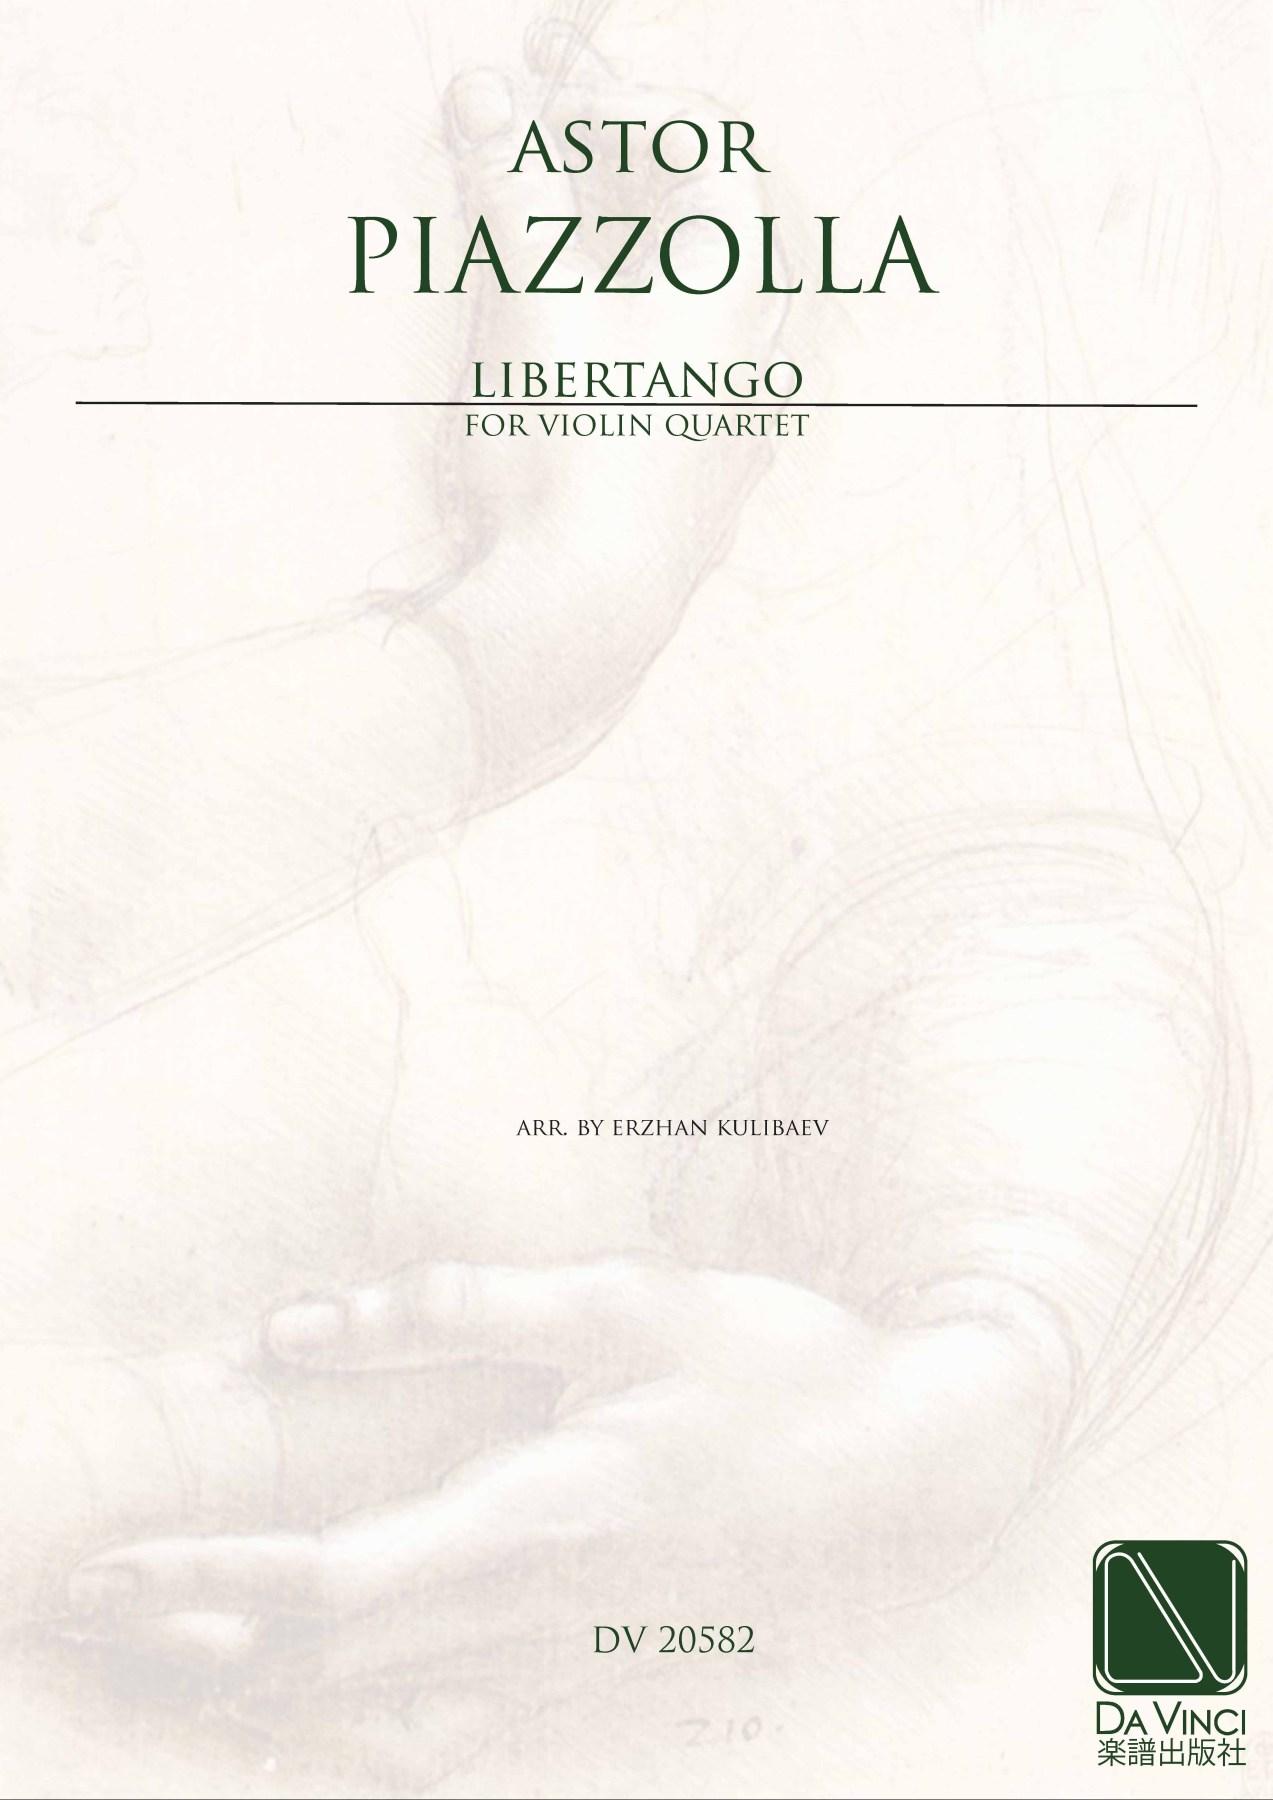 Piazzolla, Astor: Libertango, for Violin quartet